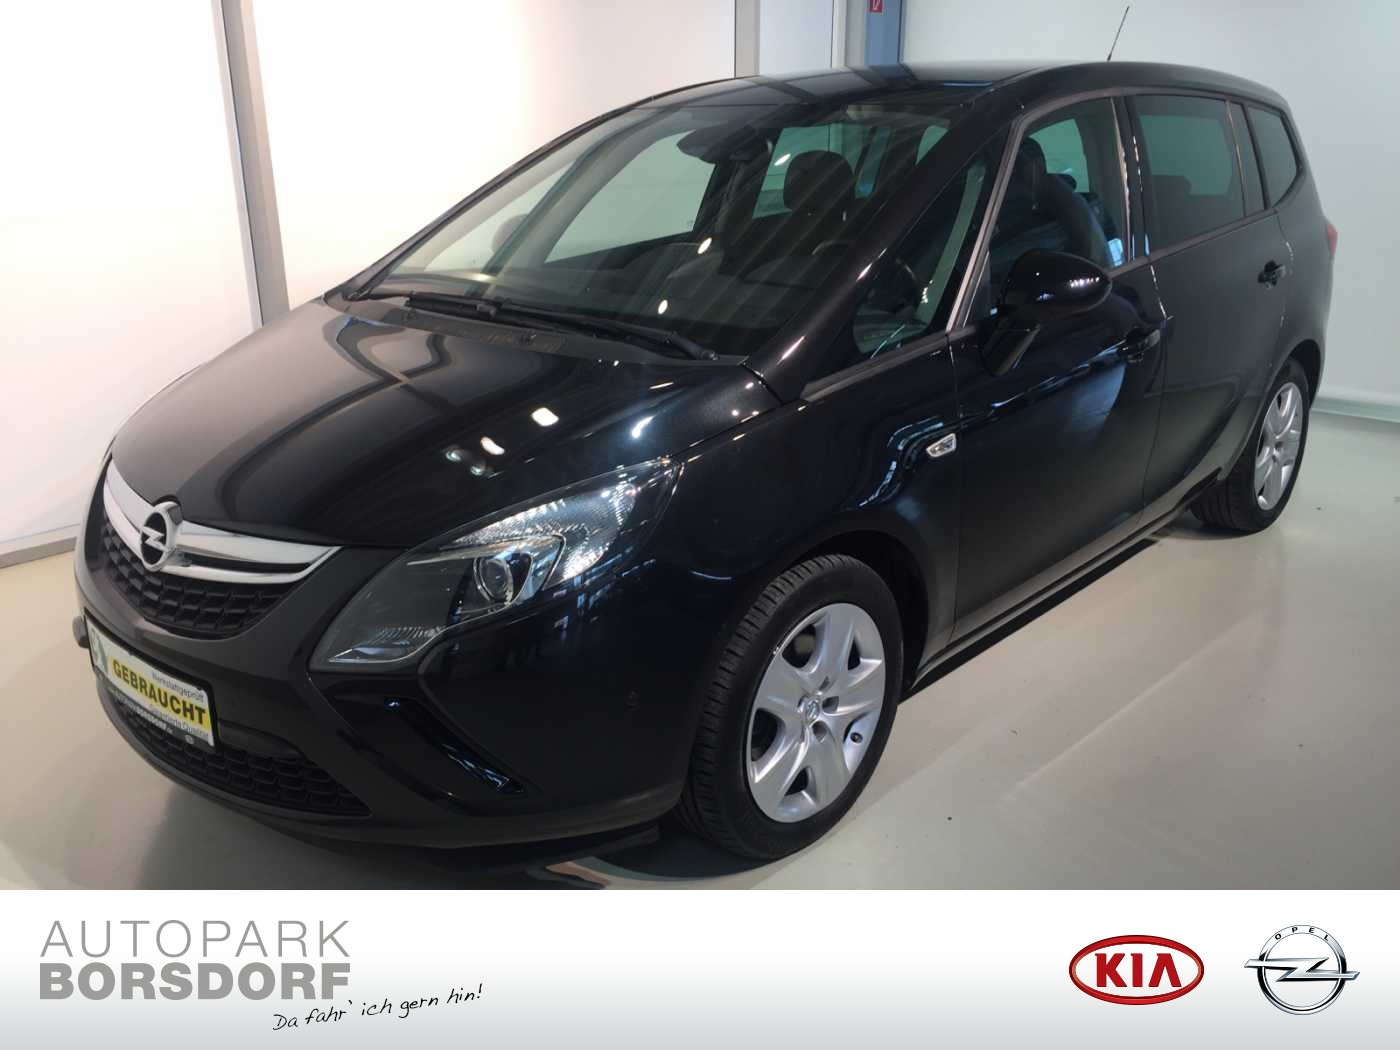 Opel Zafira Tourer 1.6 CDTI E6 Klimaautomatik PDC, Jahr 2016, Diesel